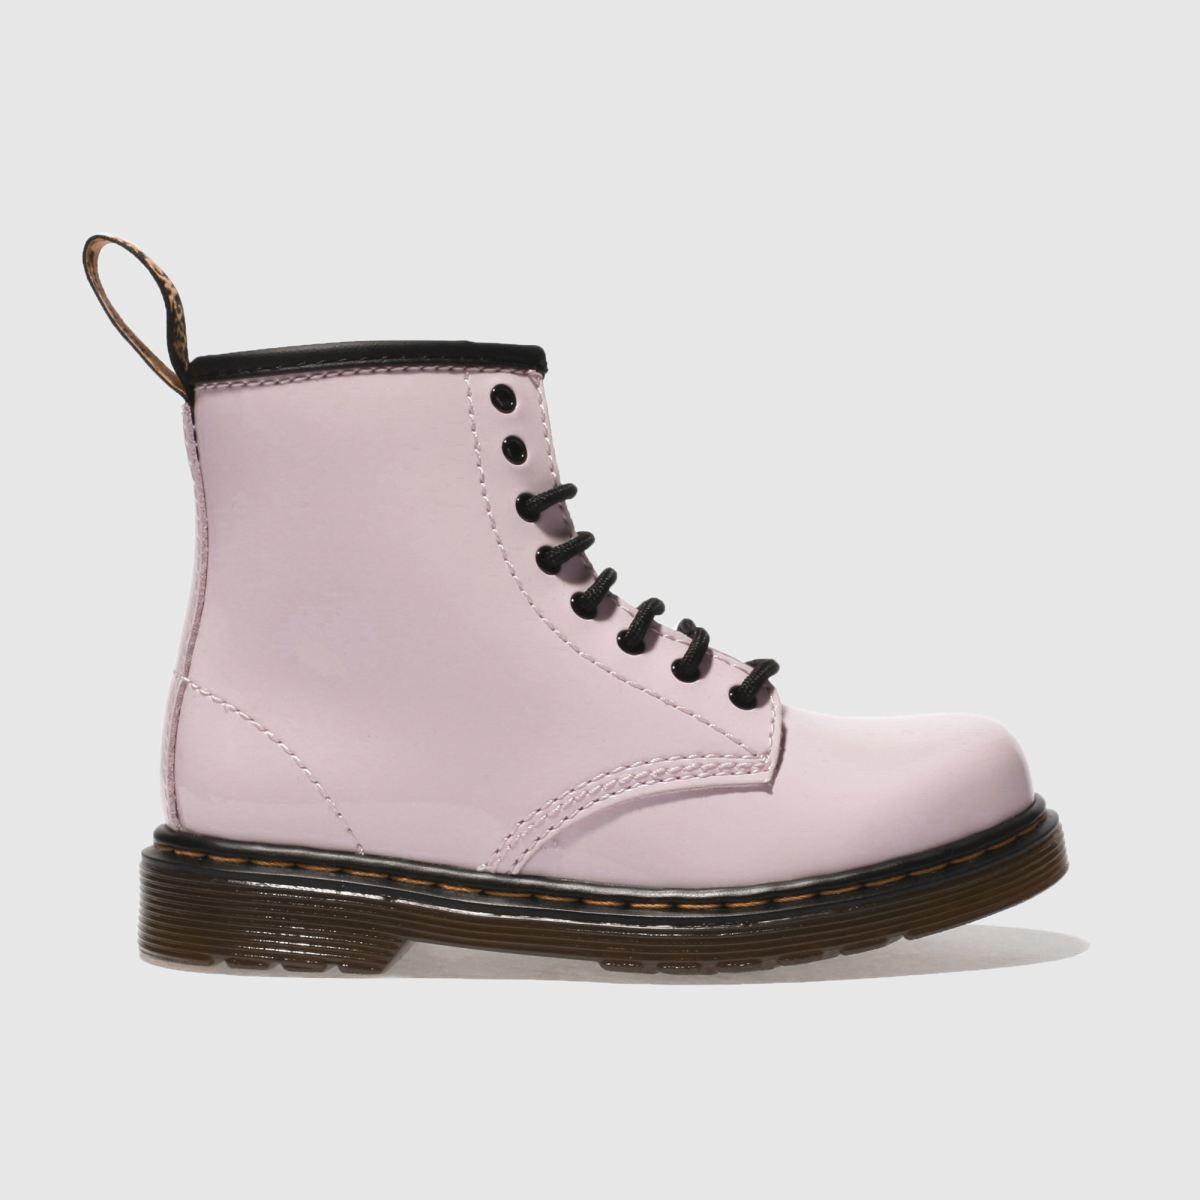 dr martens pale pink brooklee Girls Toddler Boots